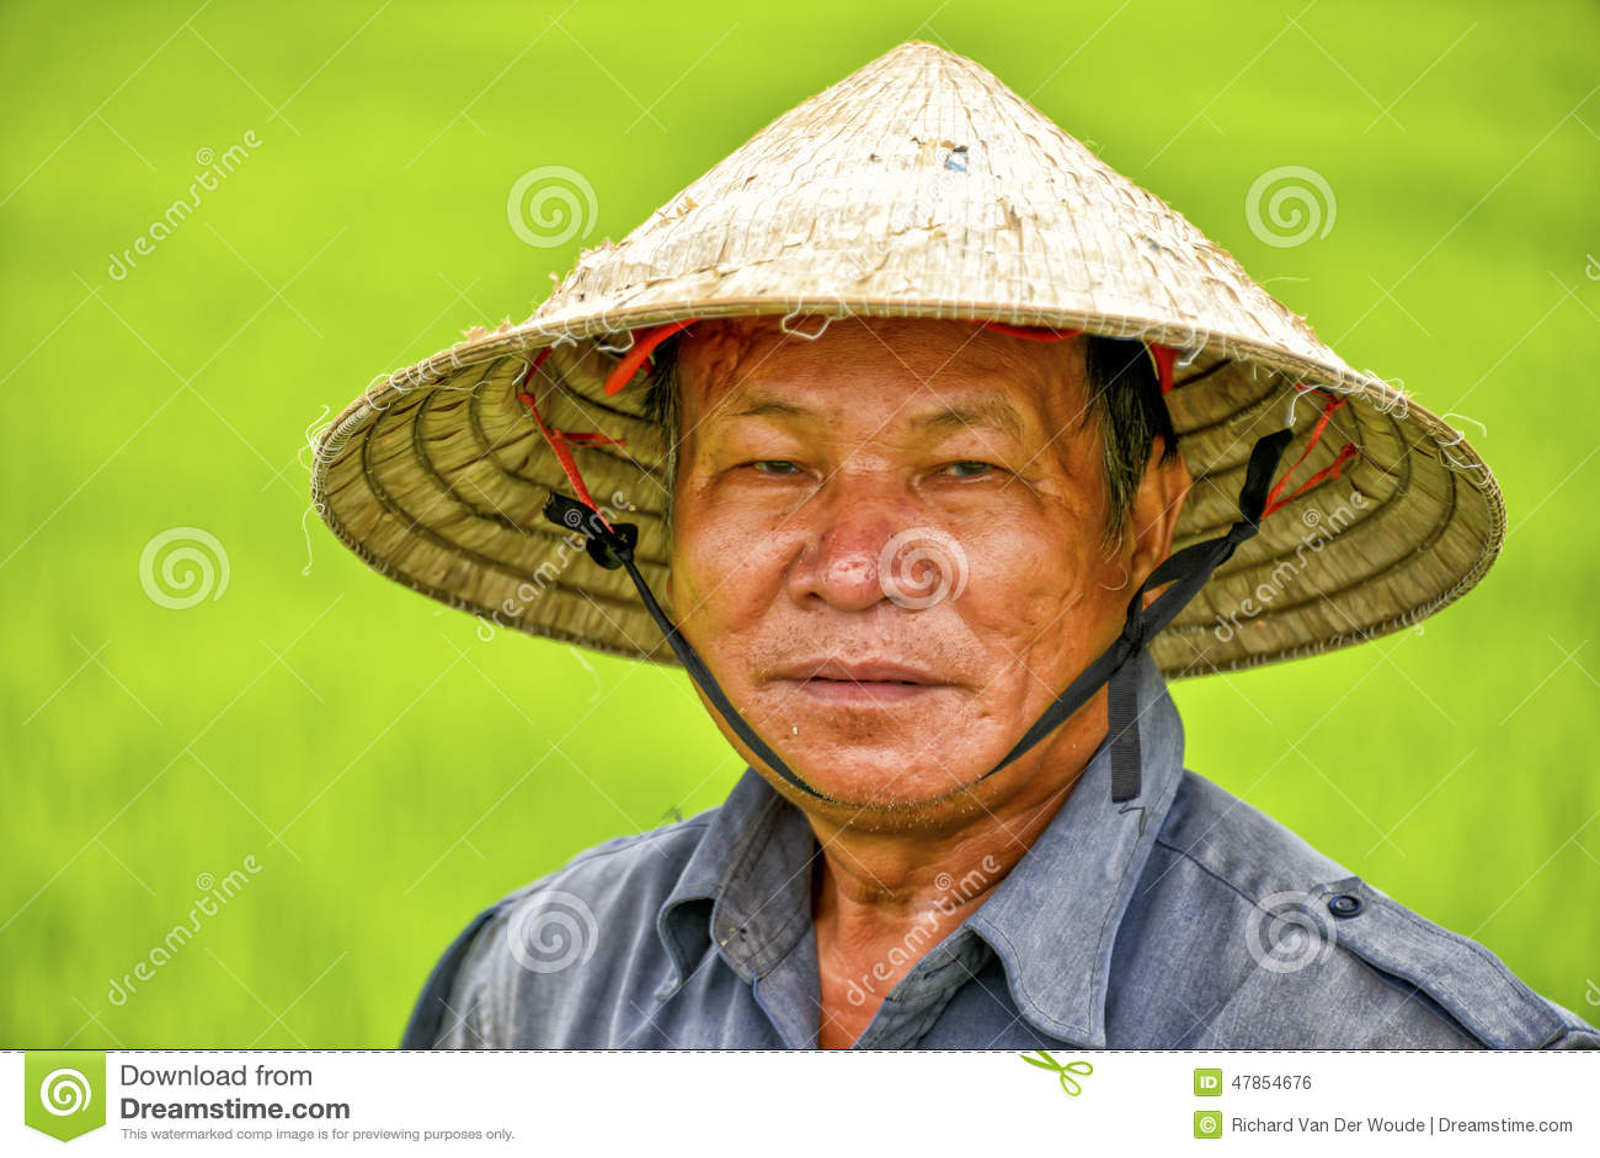 fields asian single men Free to join & browse - 1000's of asian men - interracial dating for men & women - black, white, latino, asian, everyone.